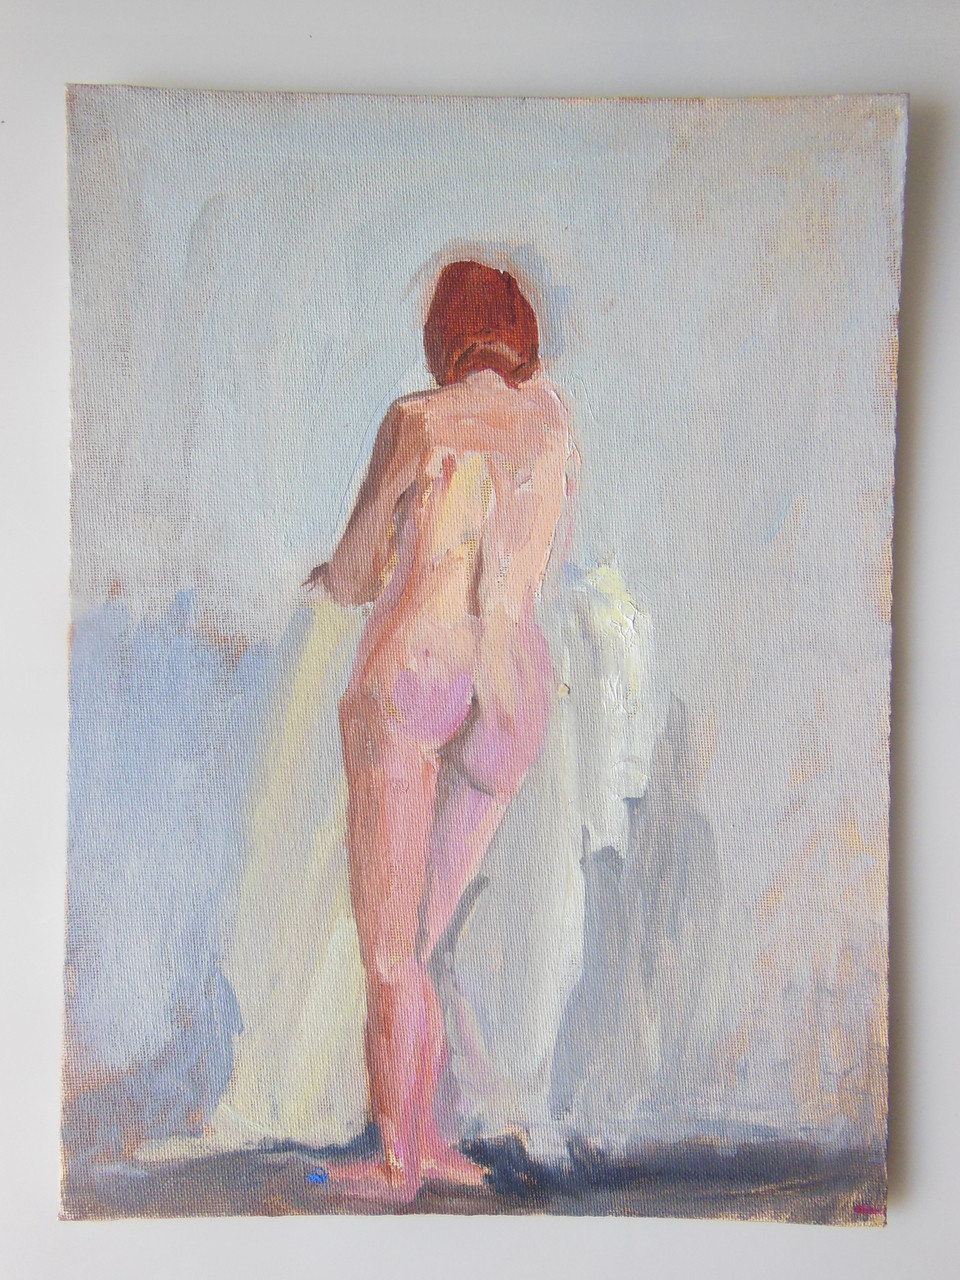 Tamara S Gordon. Nude. Oil on canvas board #15